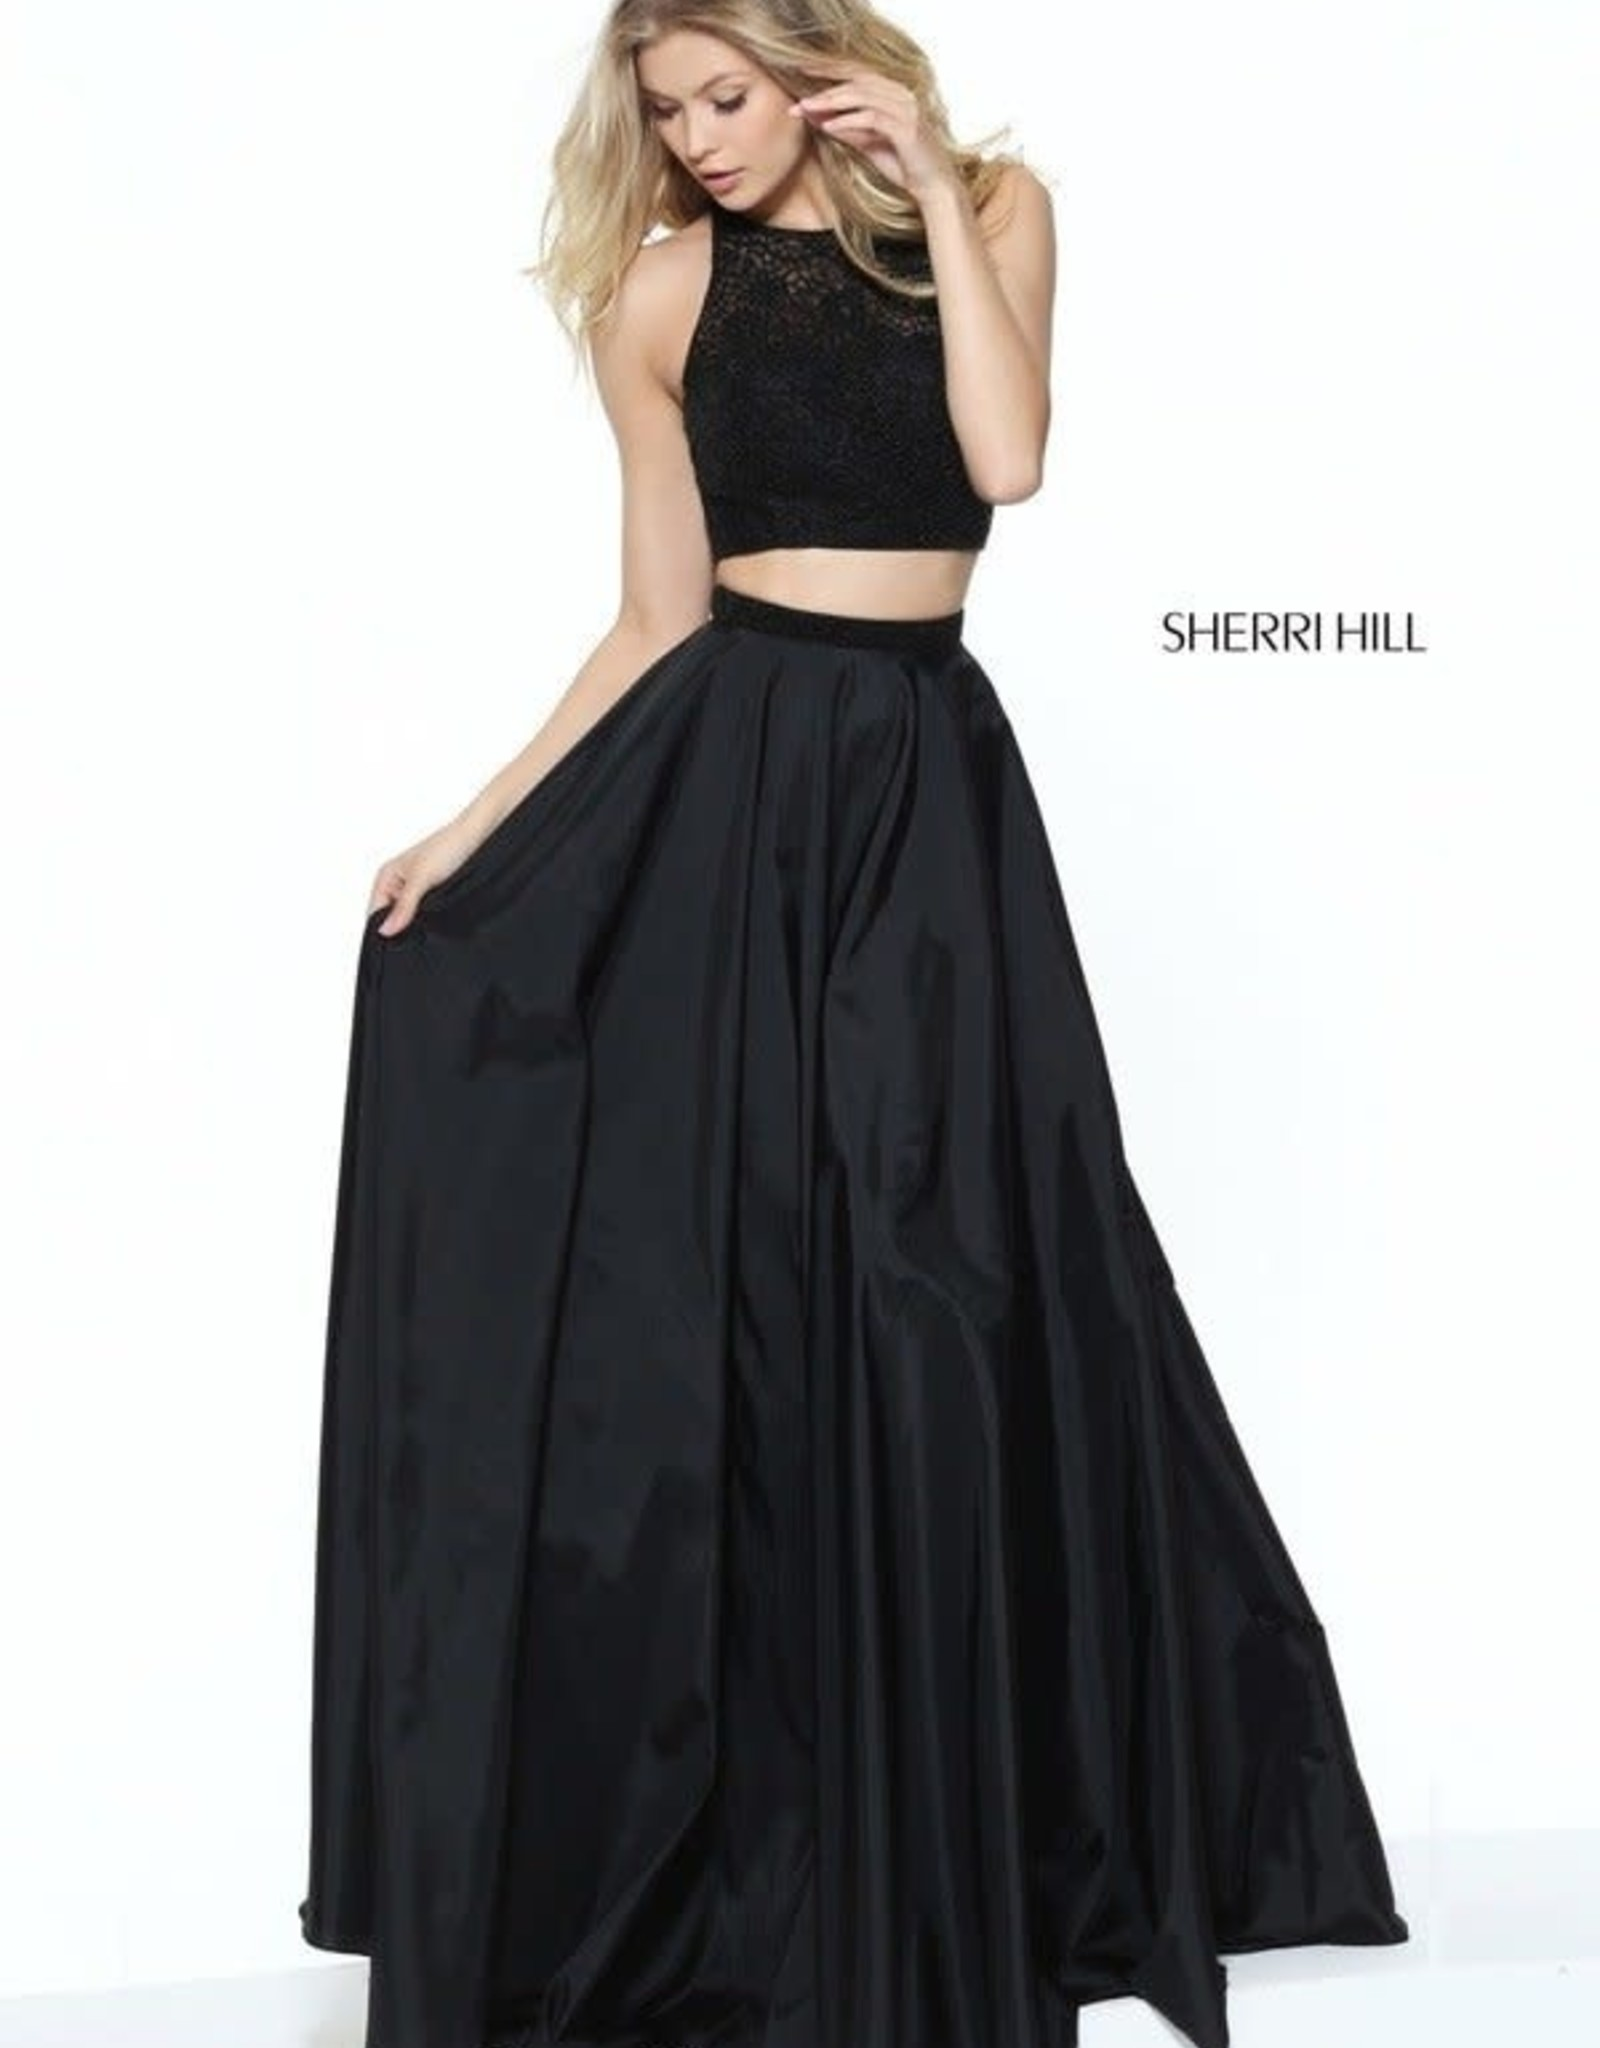 Sherri Hill Sherri Hill Black 0